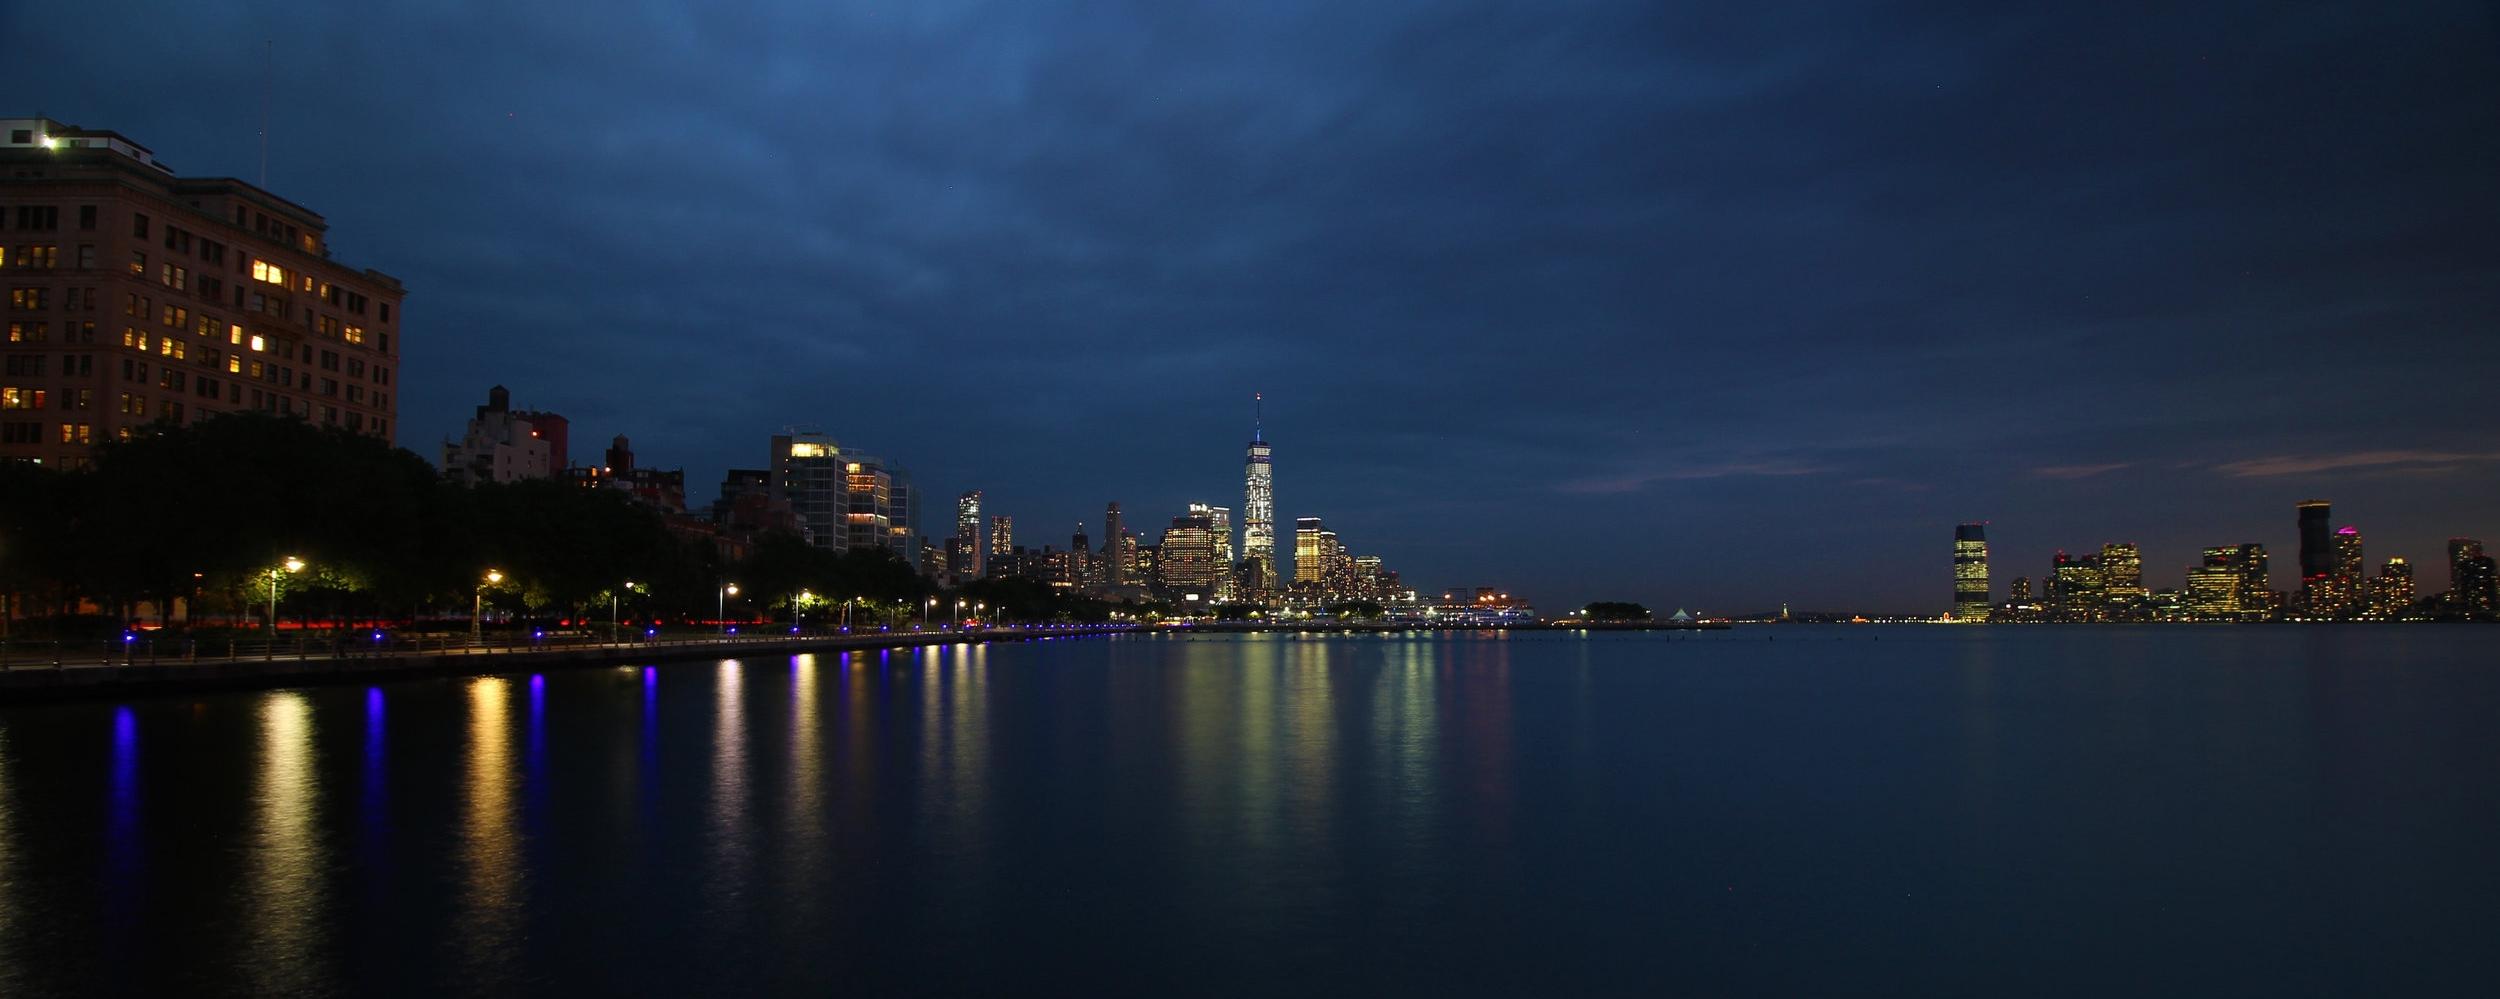 Lower Manhattan, May 24, 206